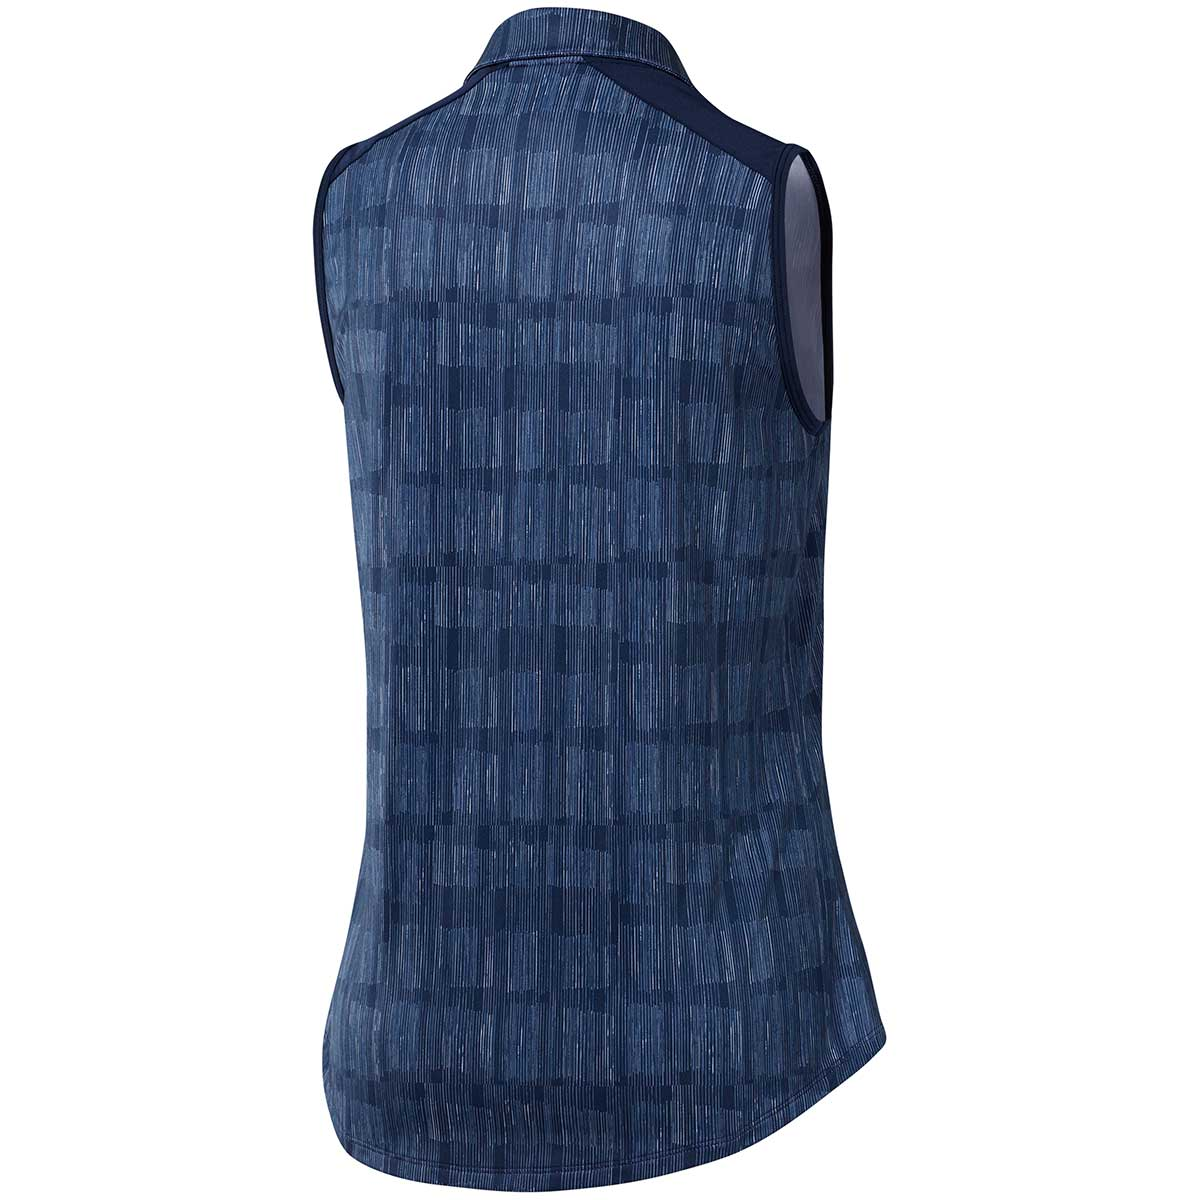 Adidas Women's Ultimate365 Sleeveless Polo Shirt - Night Indigo